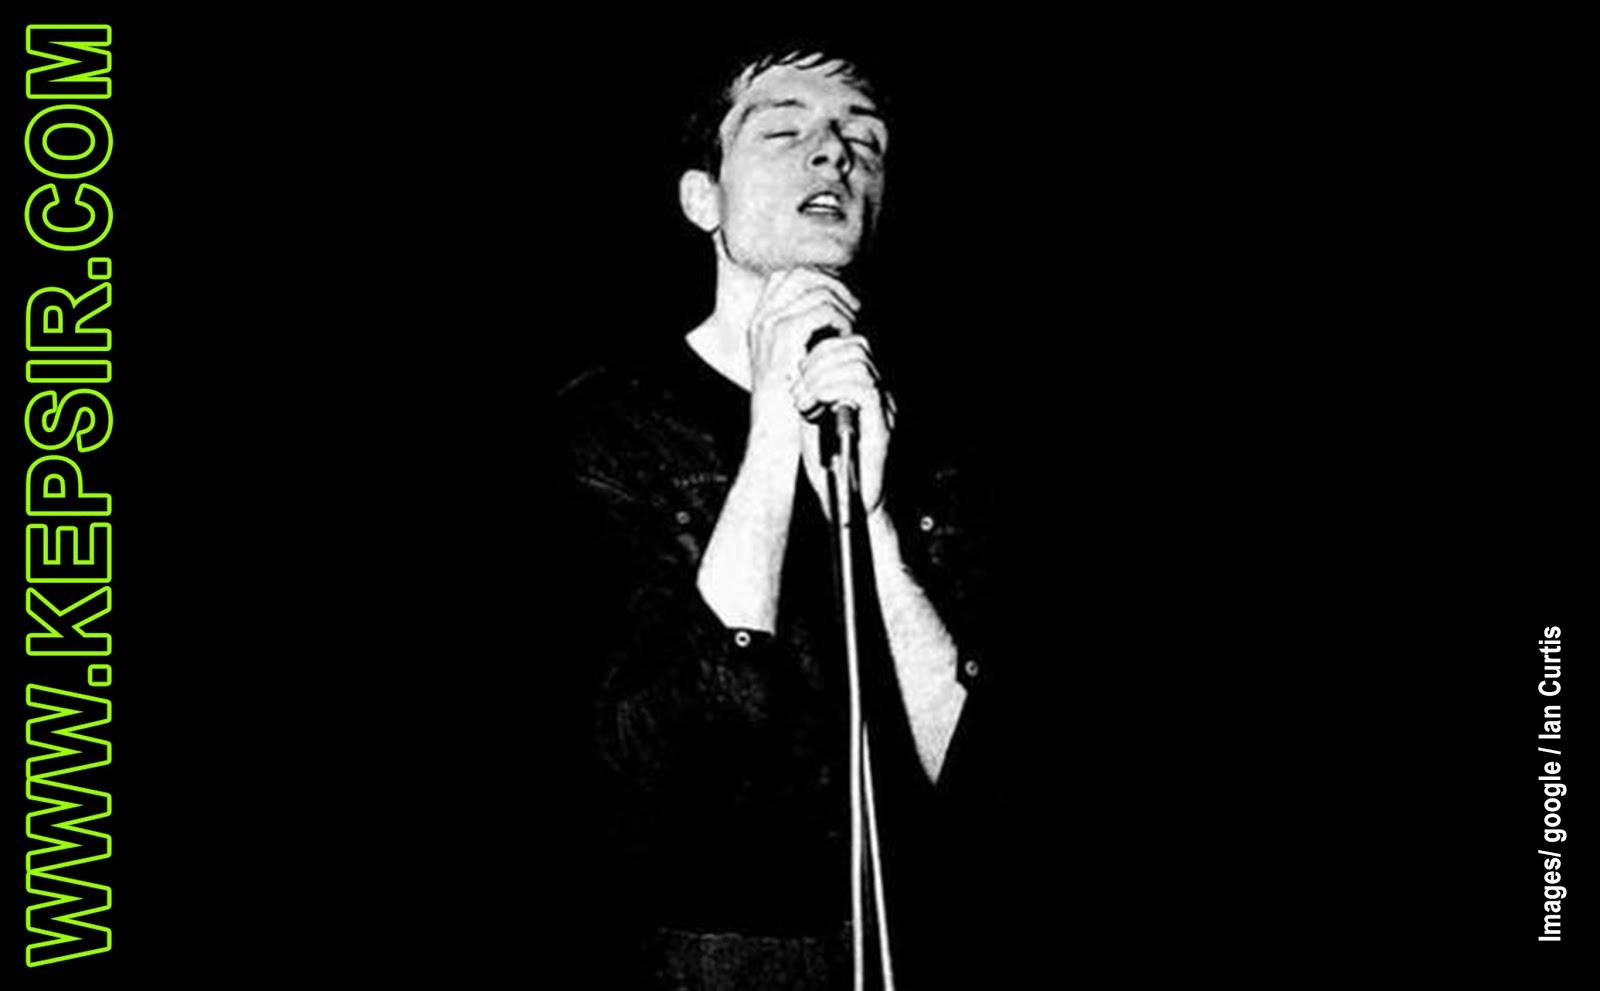 KEPSIR Ian Curtis Joy Division